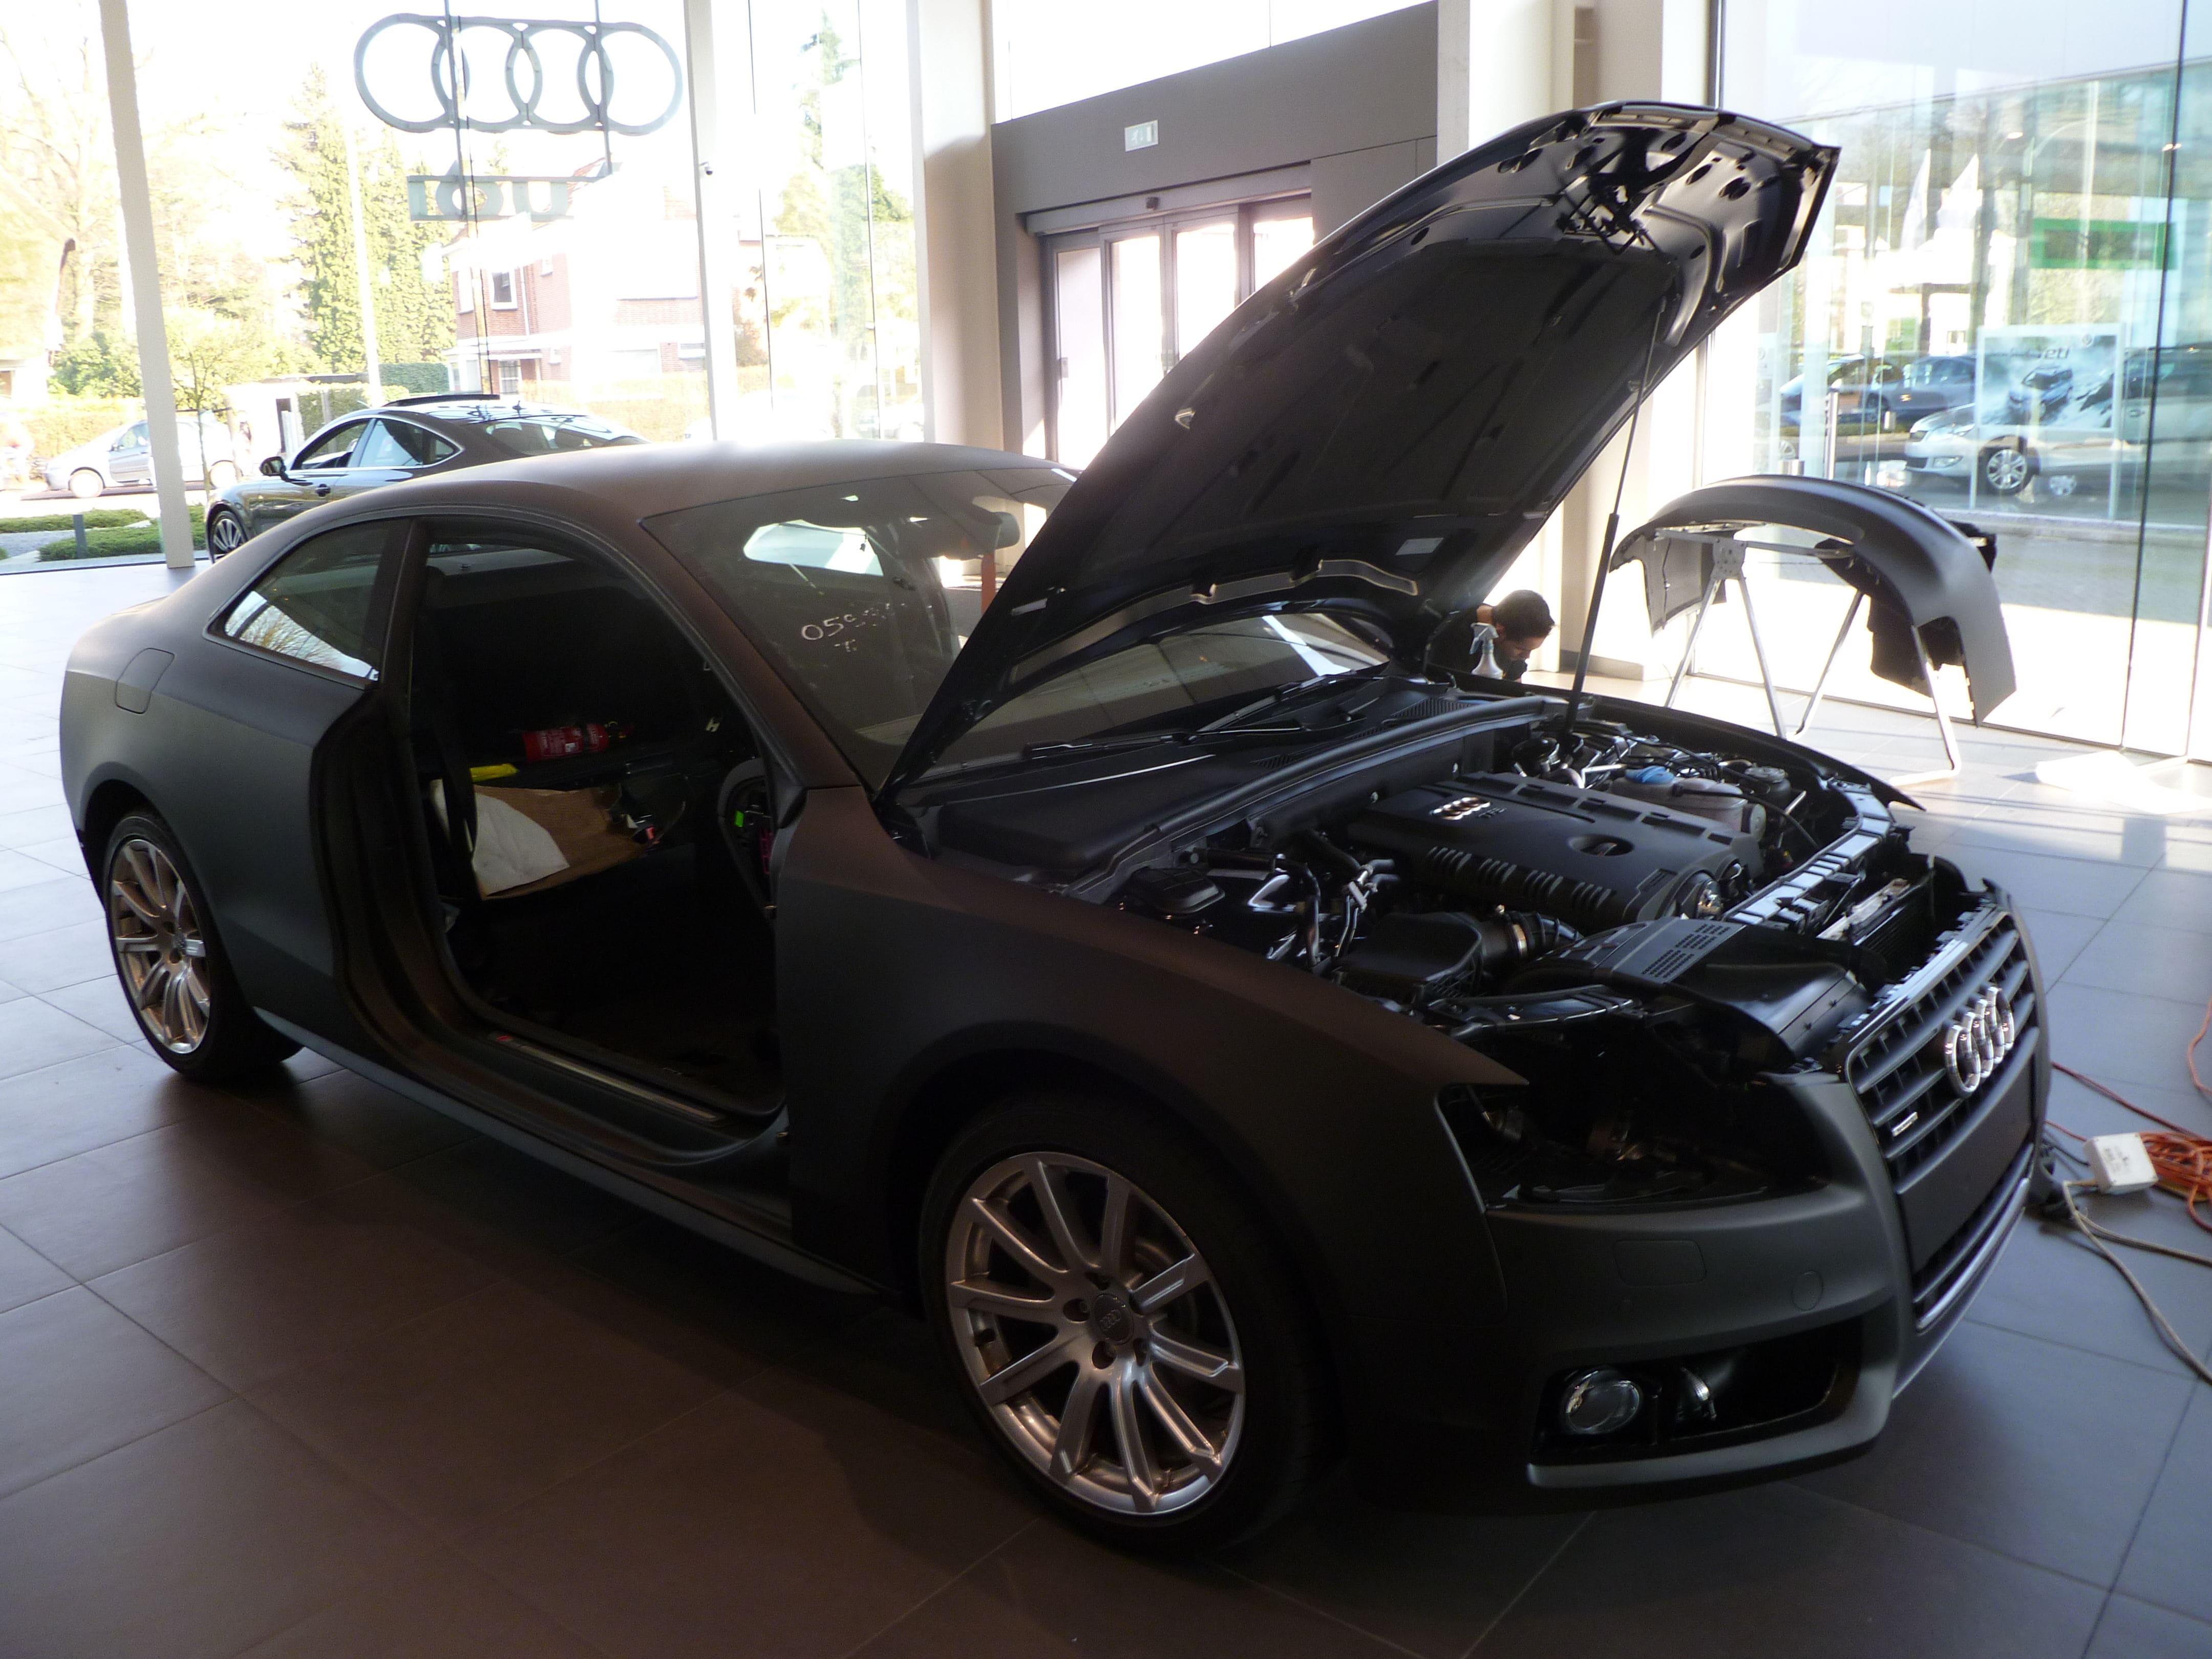 Audi A5 Coupe met Mat Zwarte Wrap, Carwrapping door Wrapmyride.nu Foto-nr:4647, ©2021